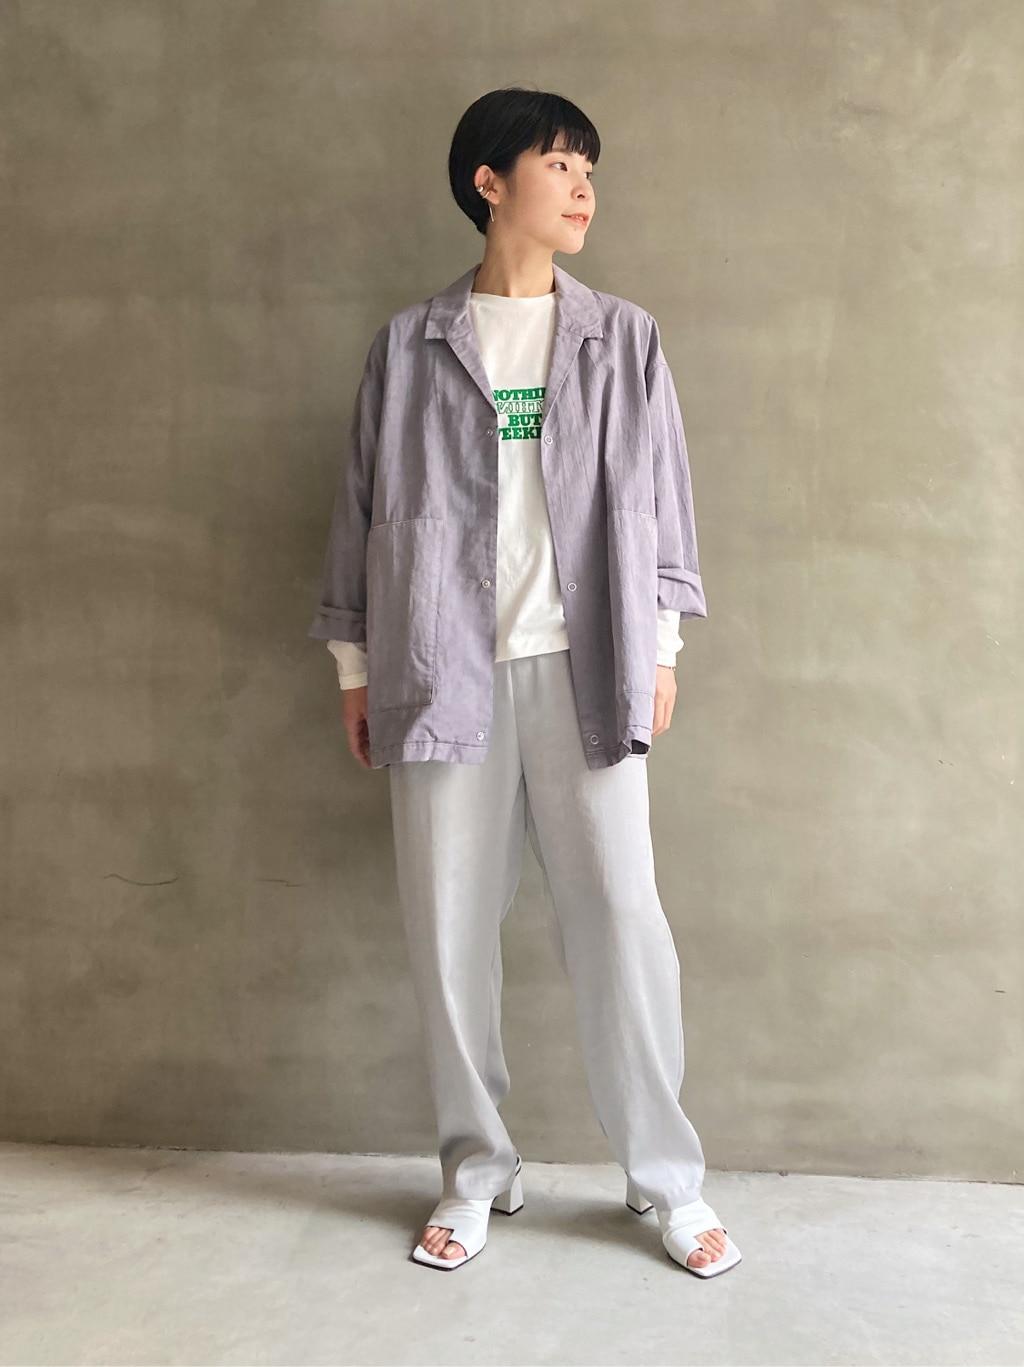 caph troupe 福岡薬院路面 身長:156cm 2021.03.02